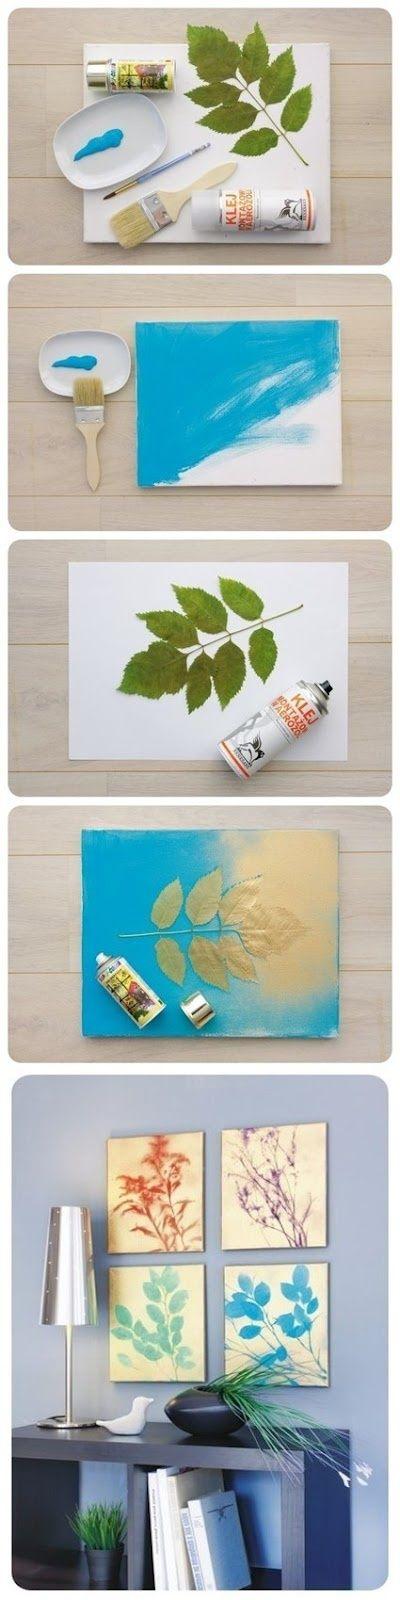 Make a Nature Wall Art on Canvas                                                                                                                                                                                 Más